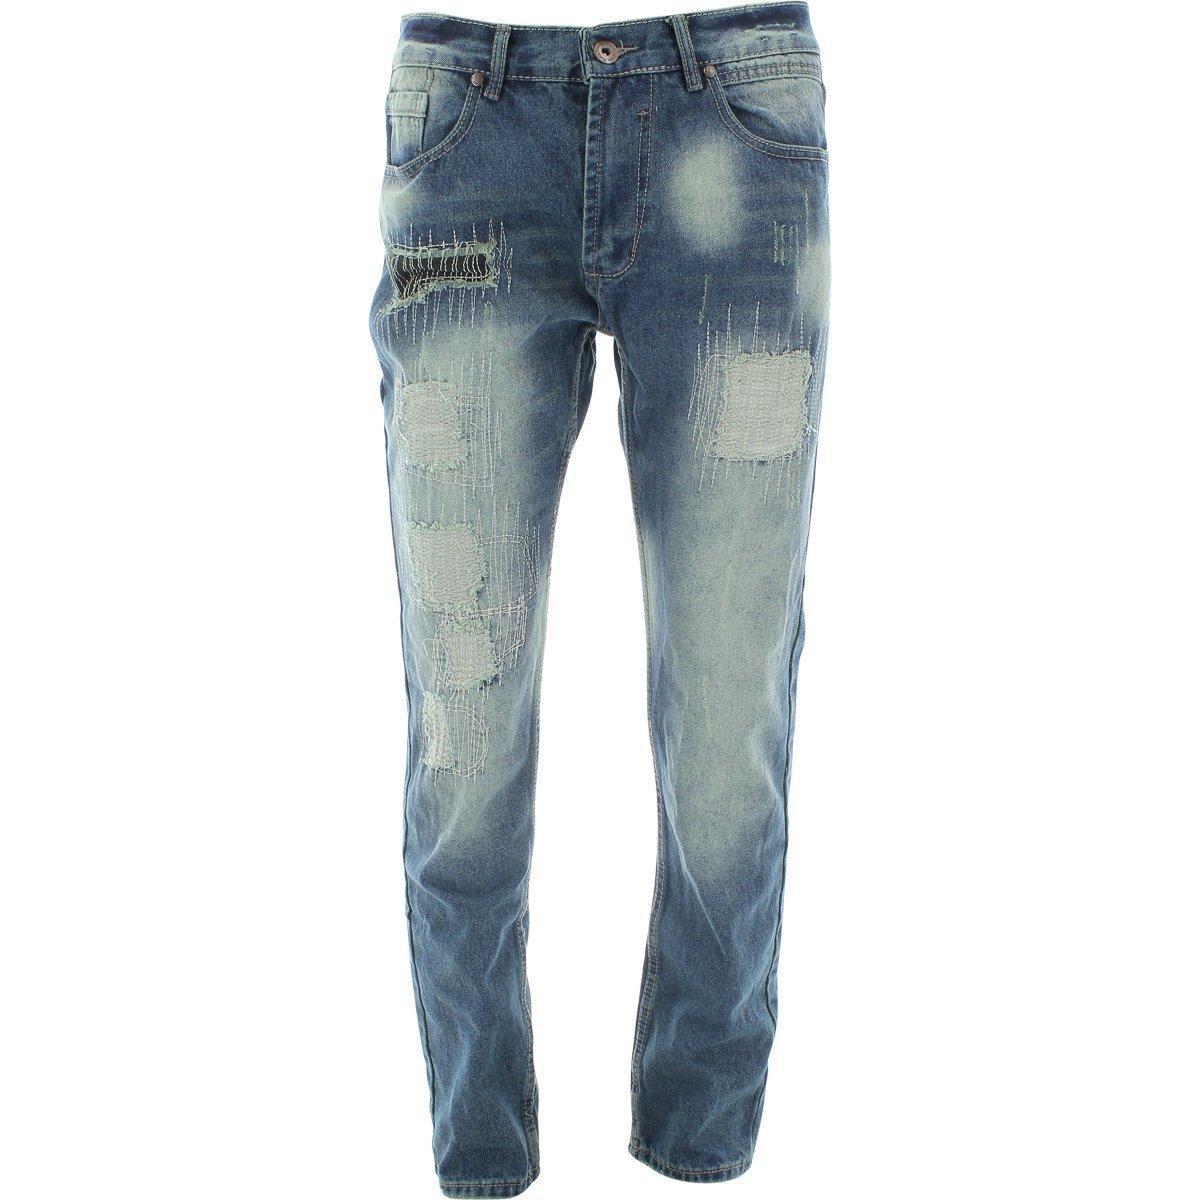 Denim Culture - Men's Ripped And Repair Jeans - Dark Blue